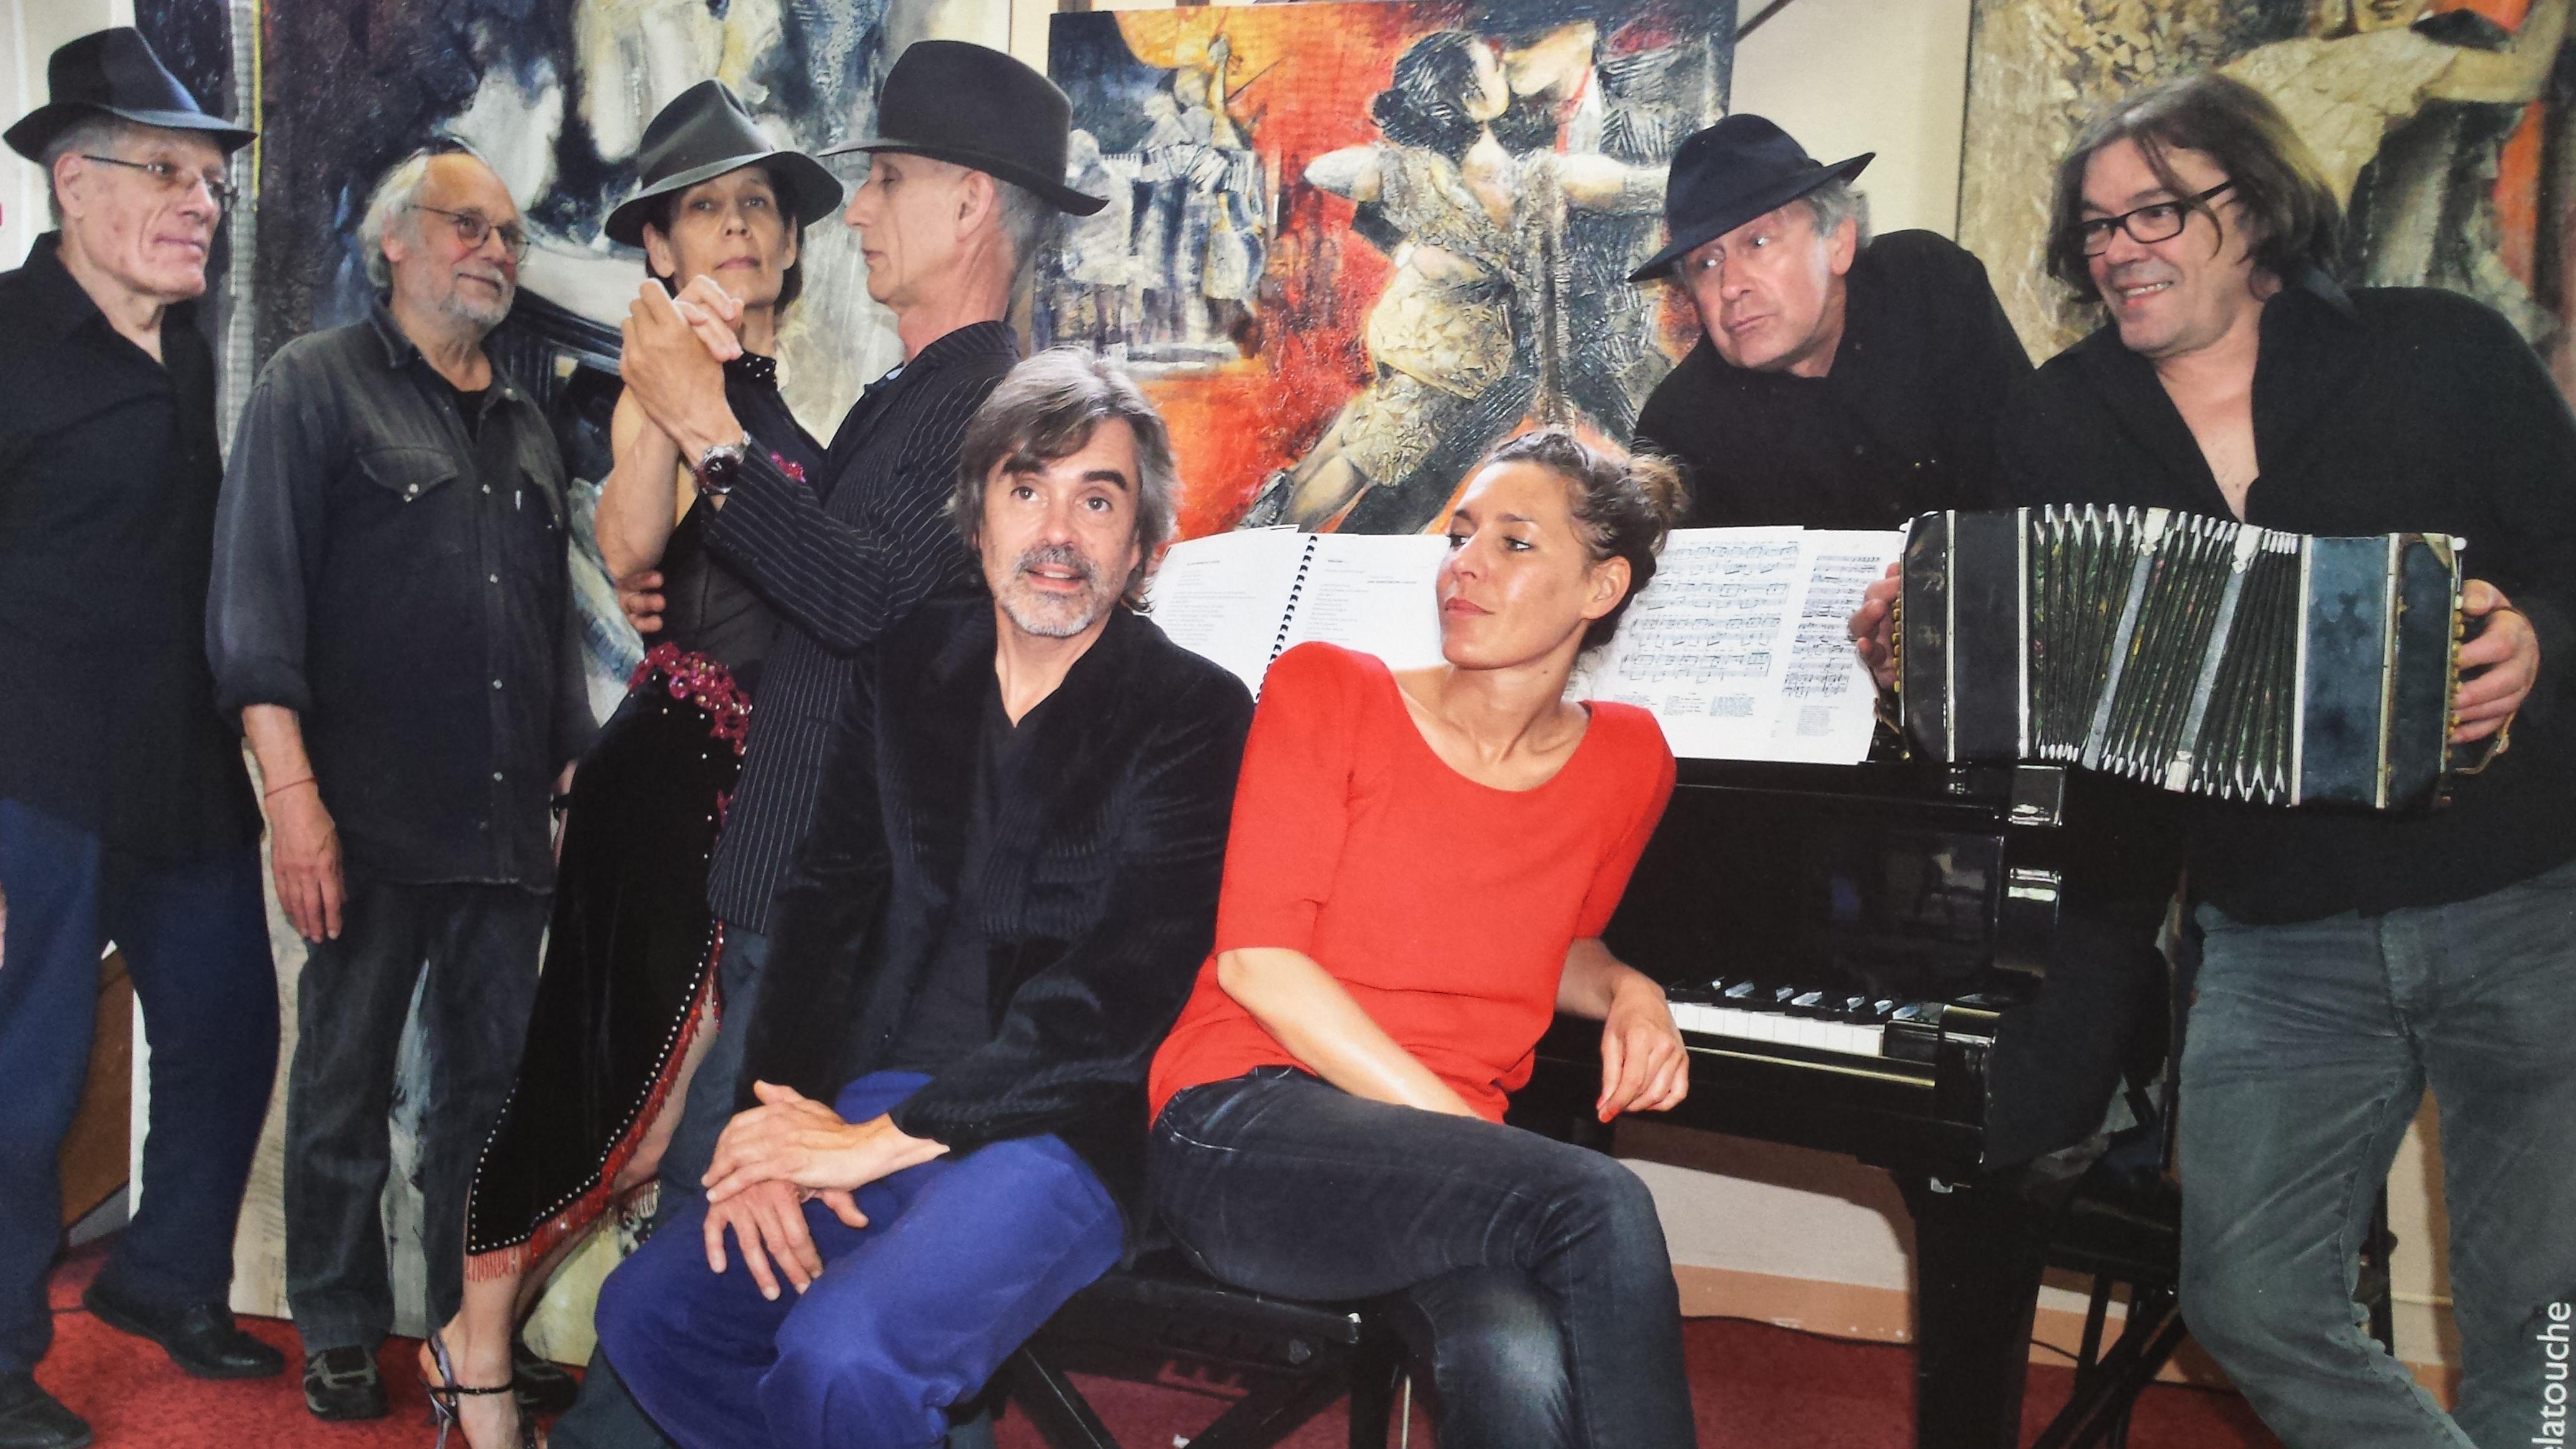 cabaret-tango-clindoeil-orleans